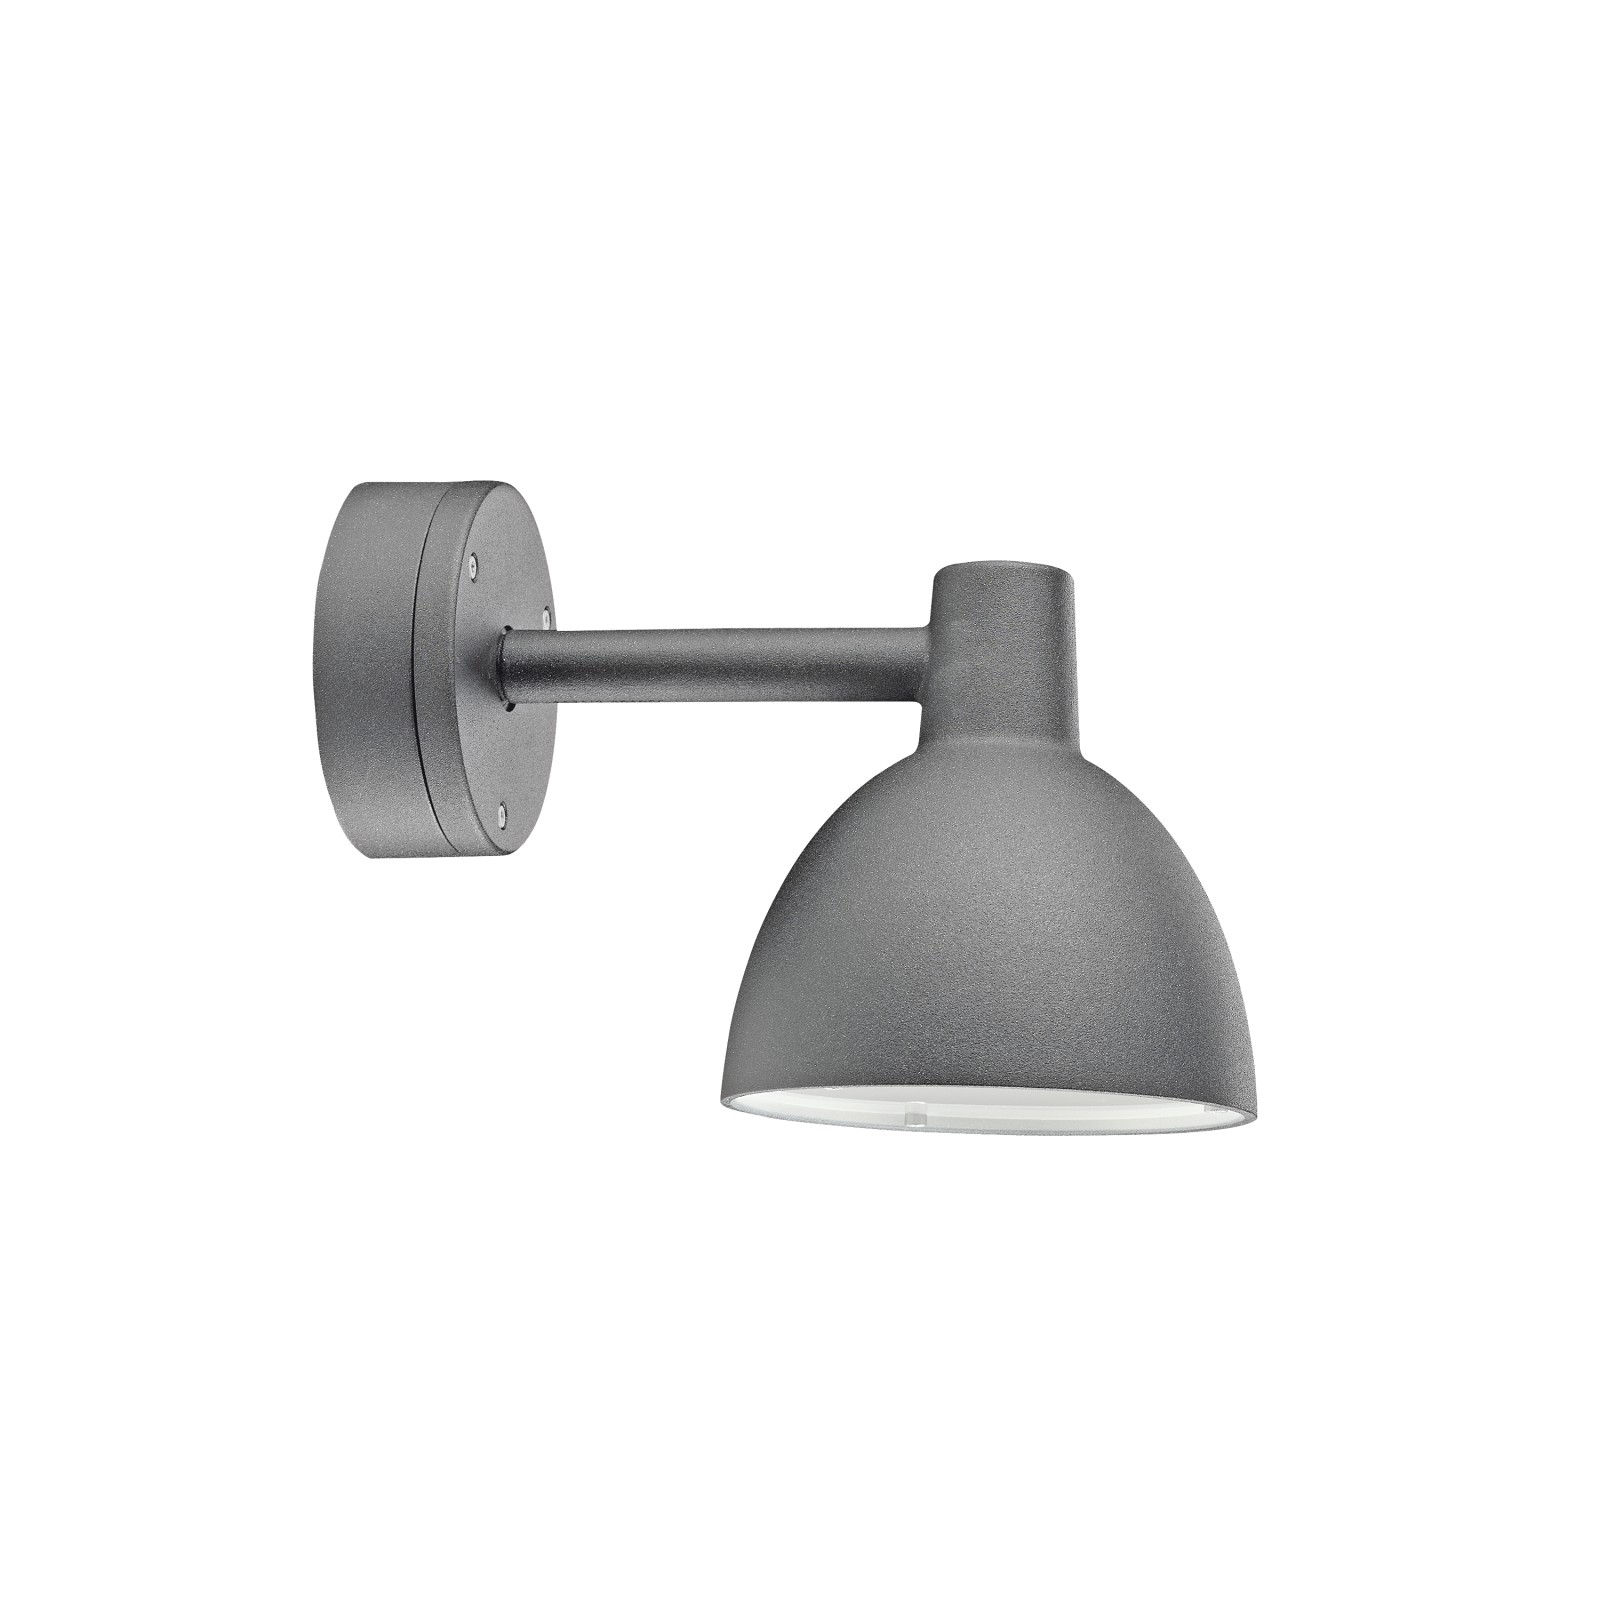 Toldbod 155 Outdoor Wall Light Aluminium Coloured